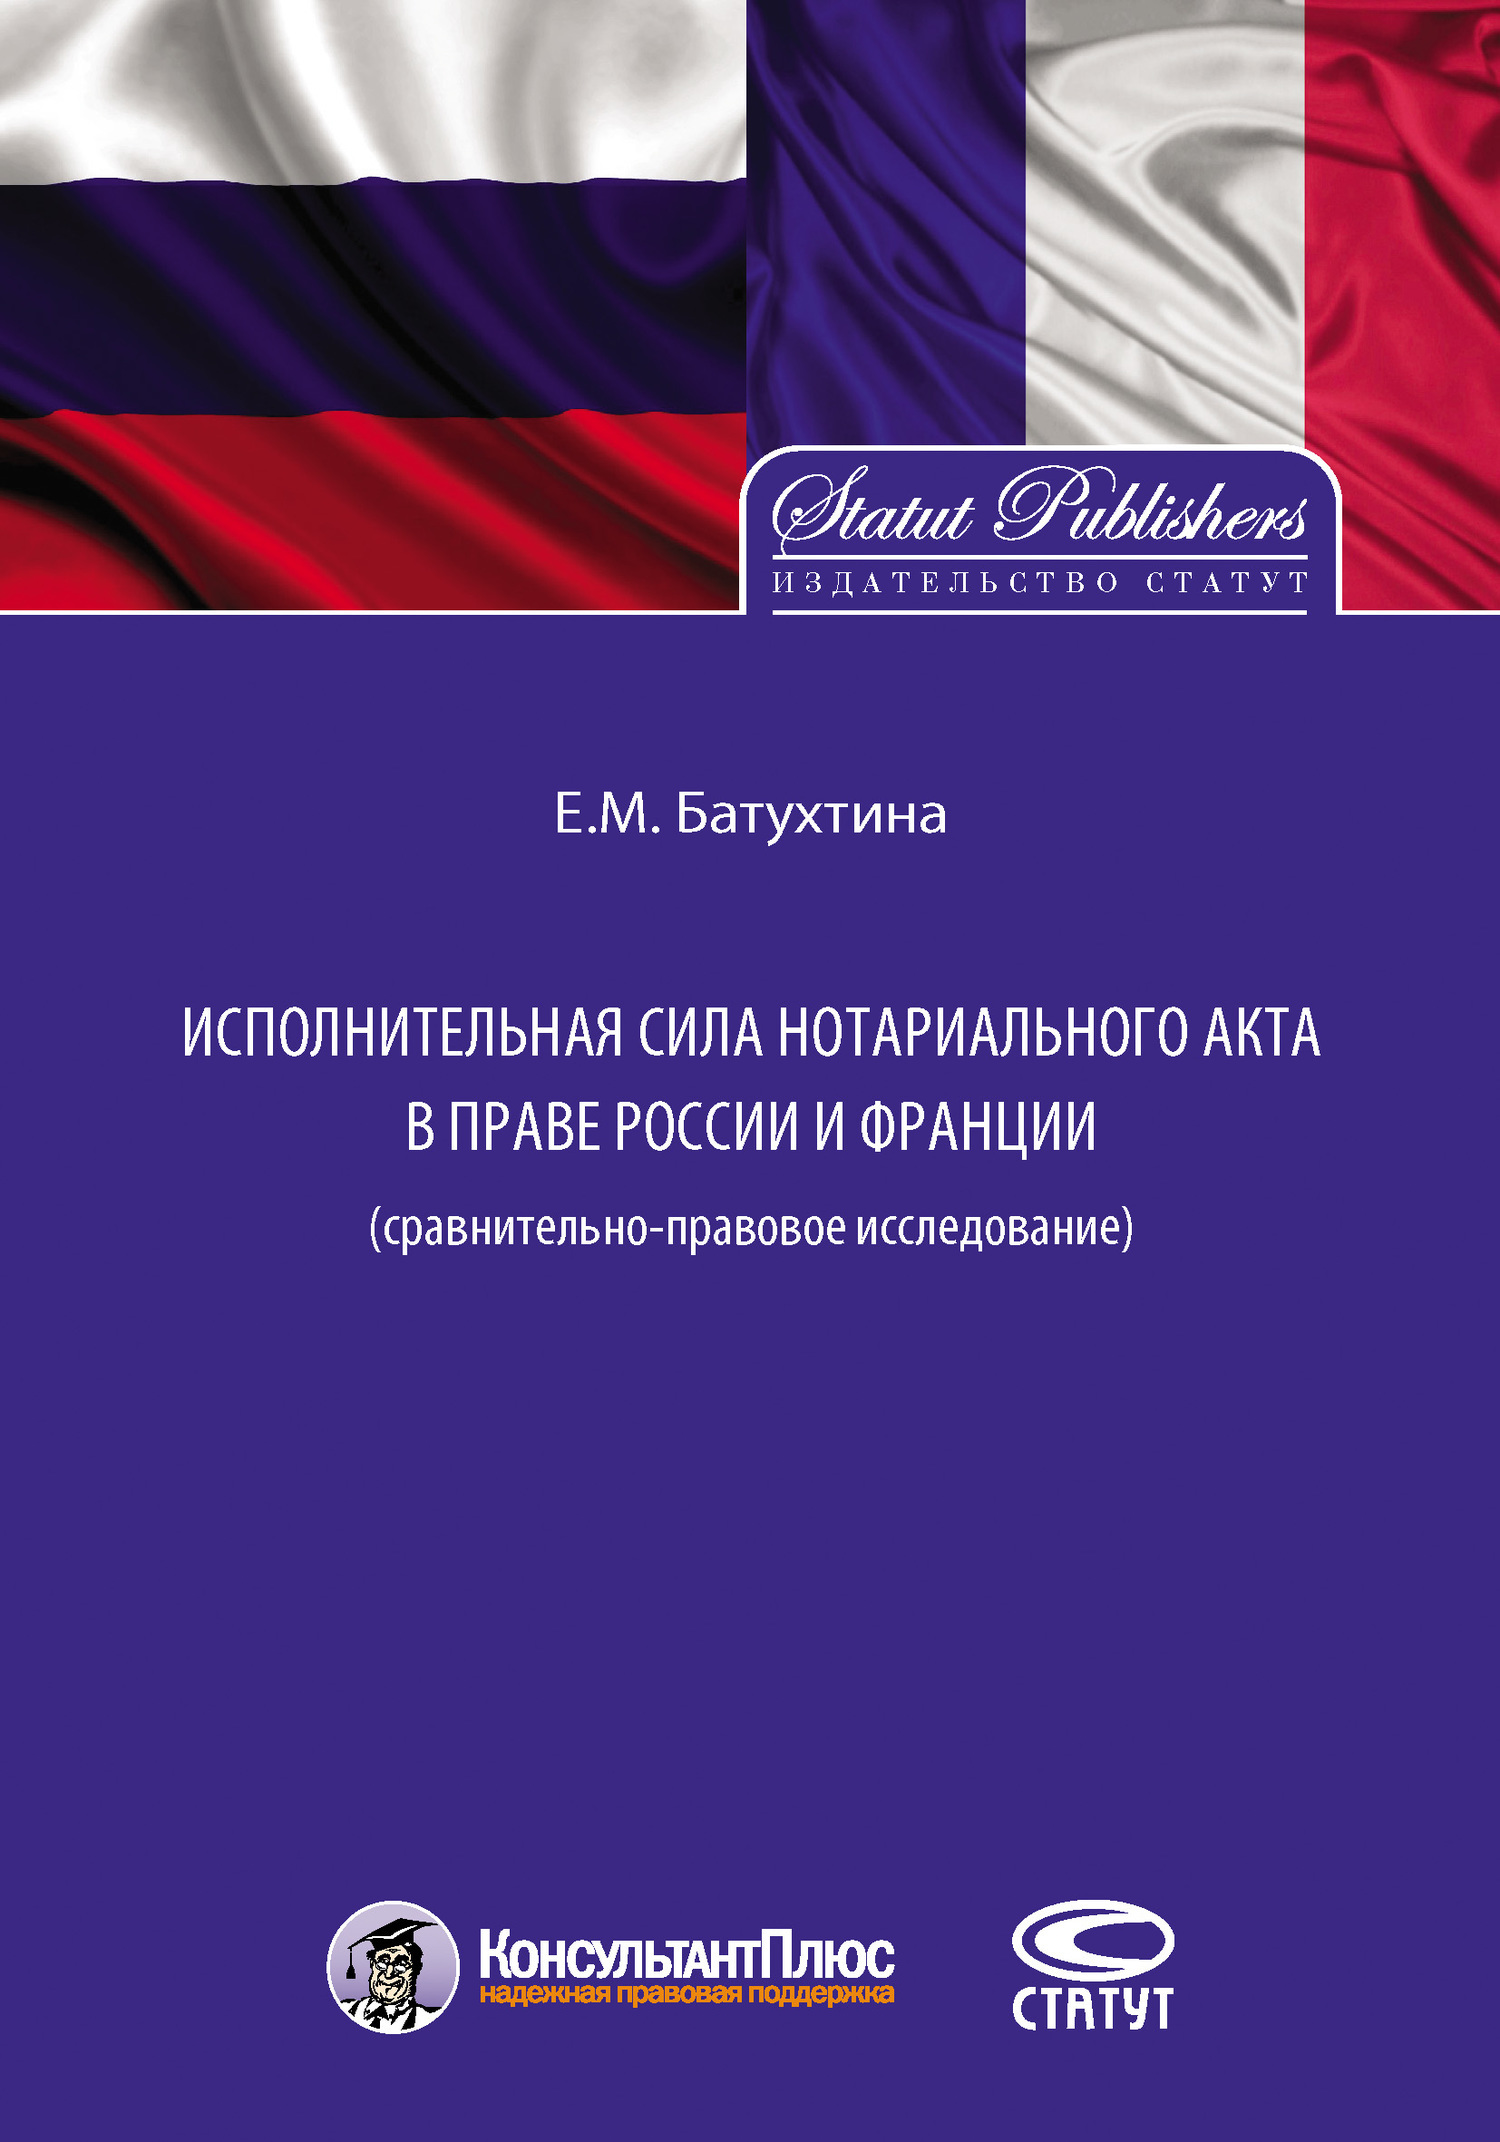 Обложка книги. Автор - Елена Батухтина